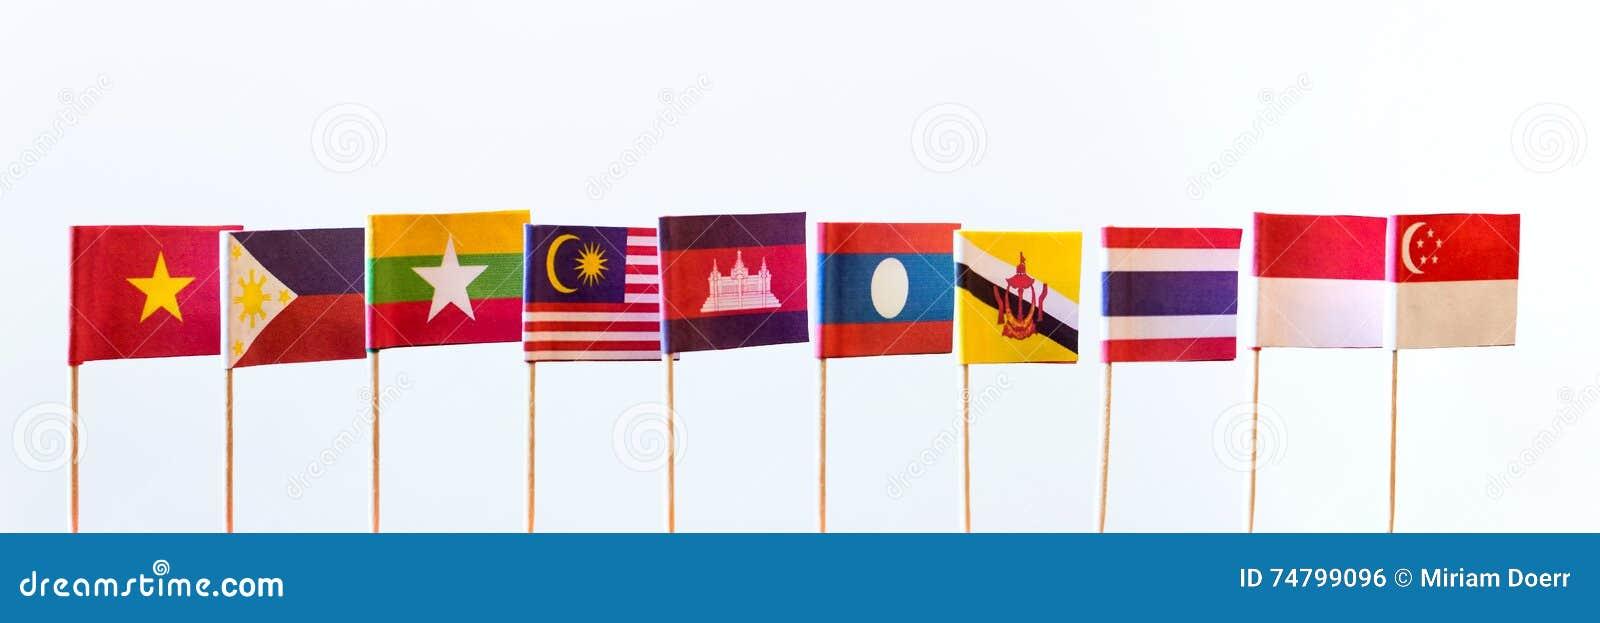 Flags of asean members